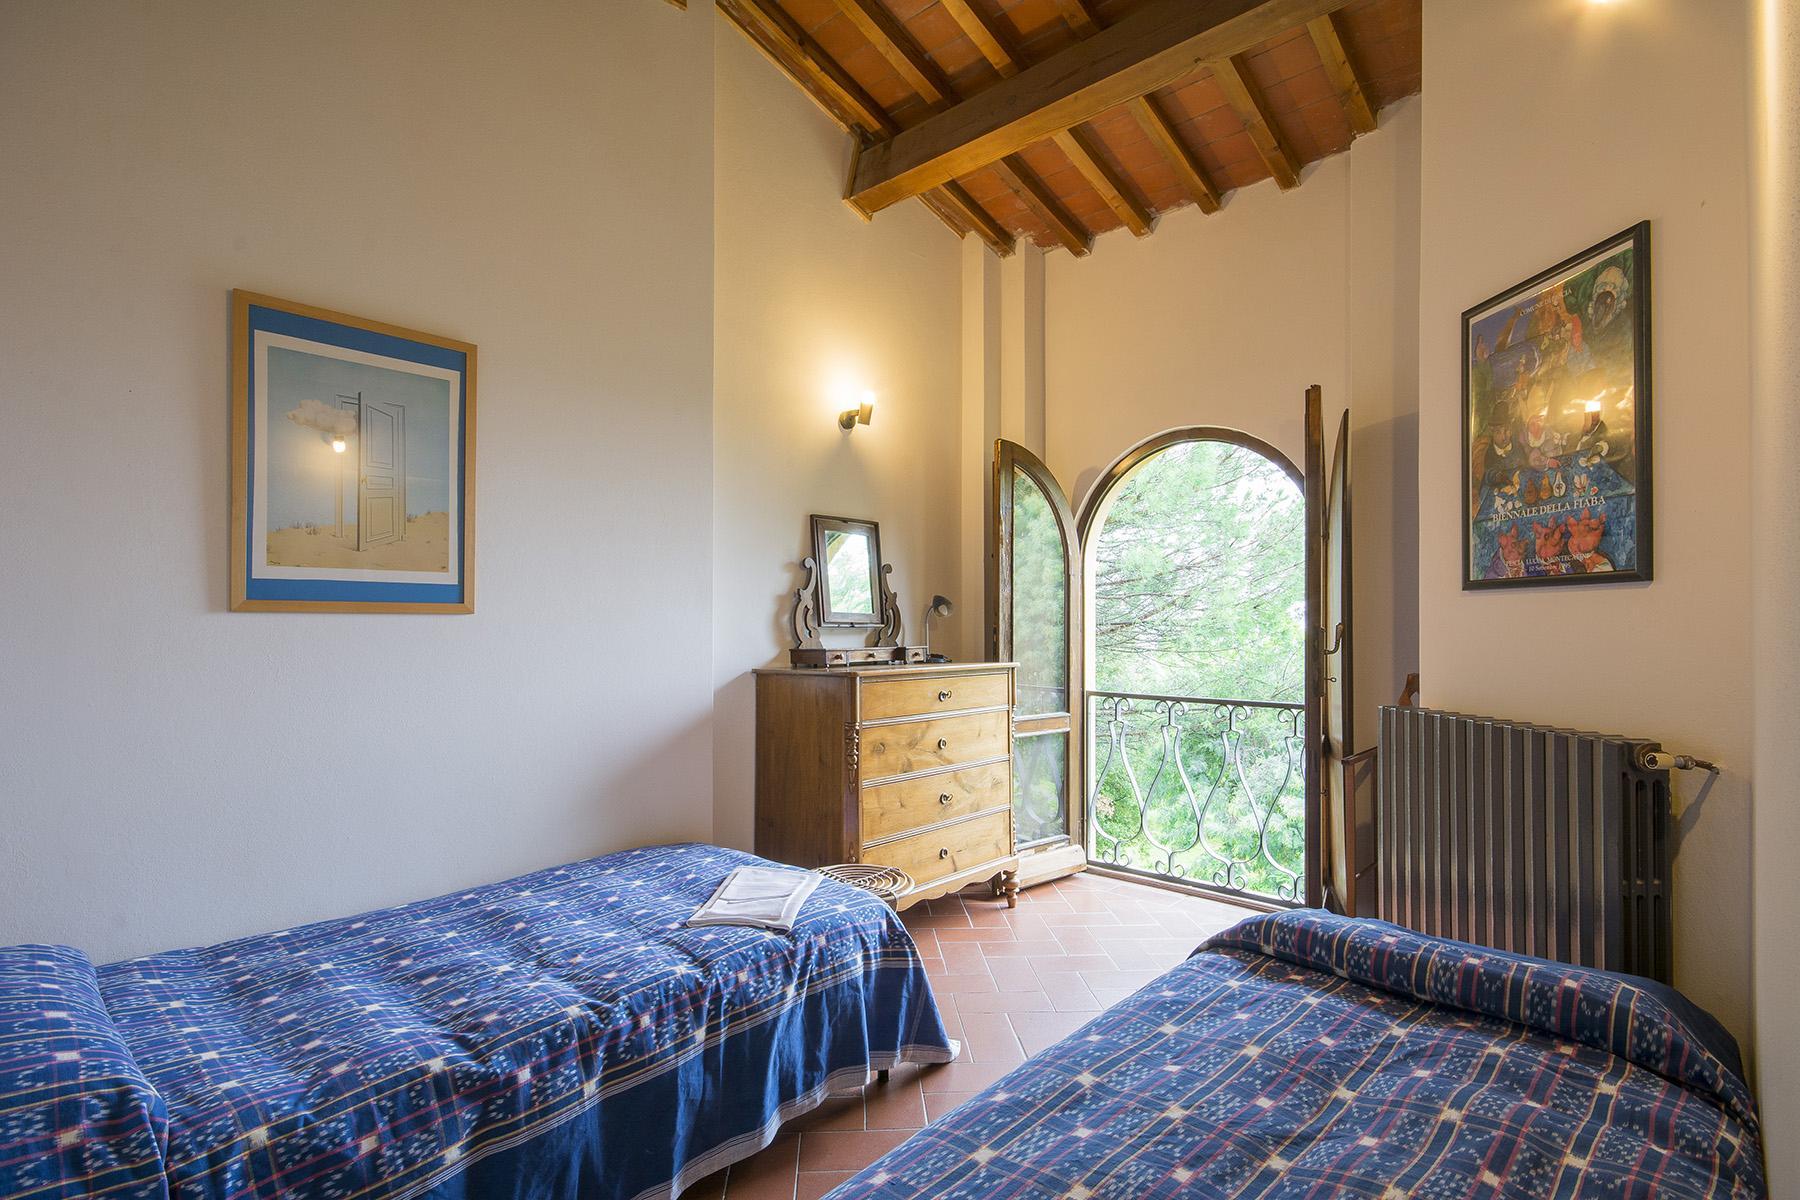 Pescia小山丘上美丽的乡间农舍 - 23